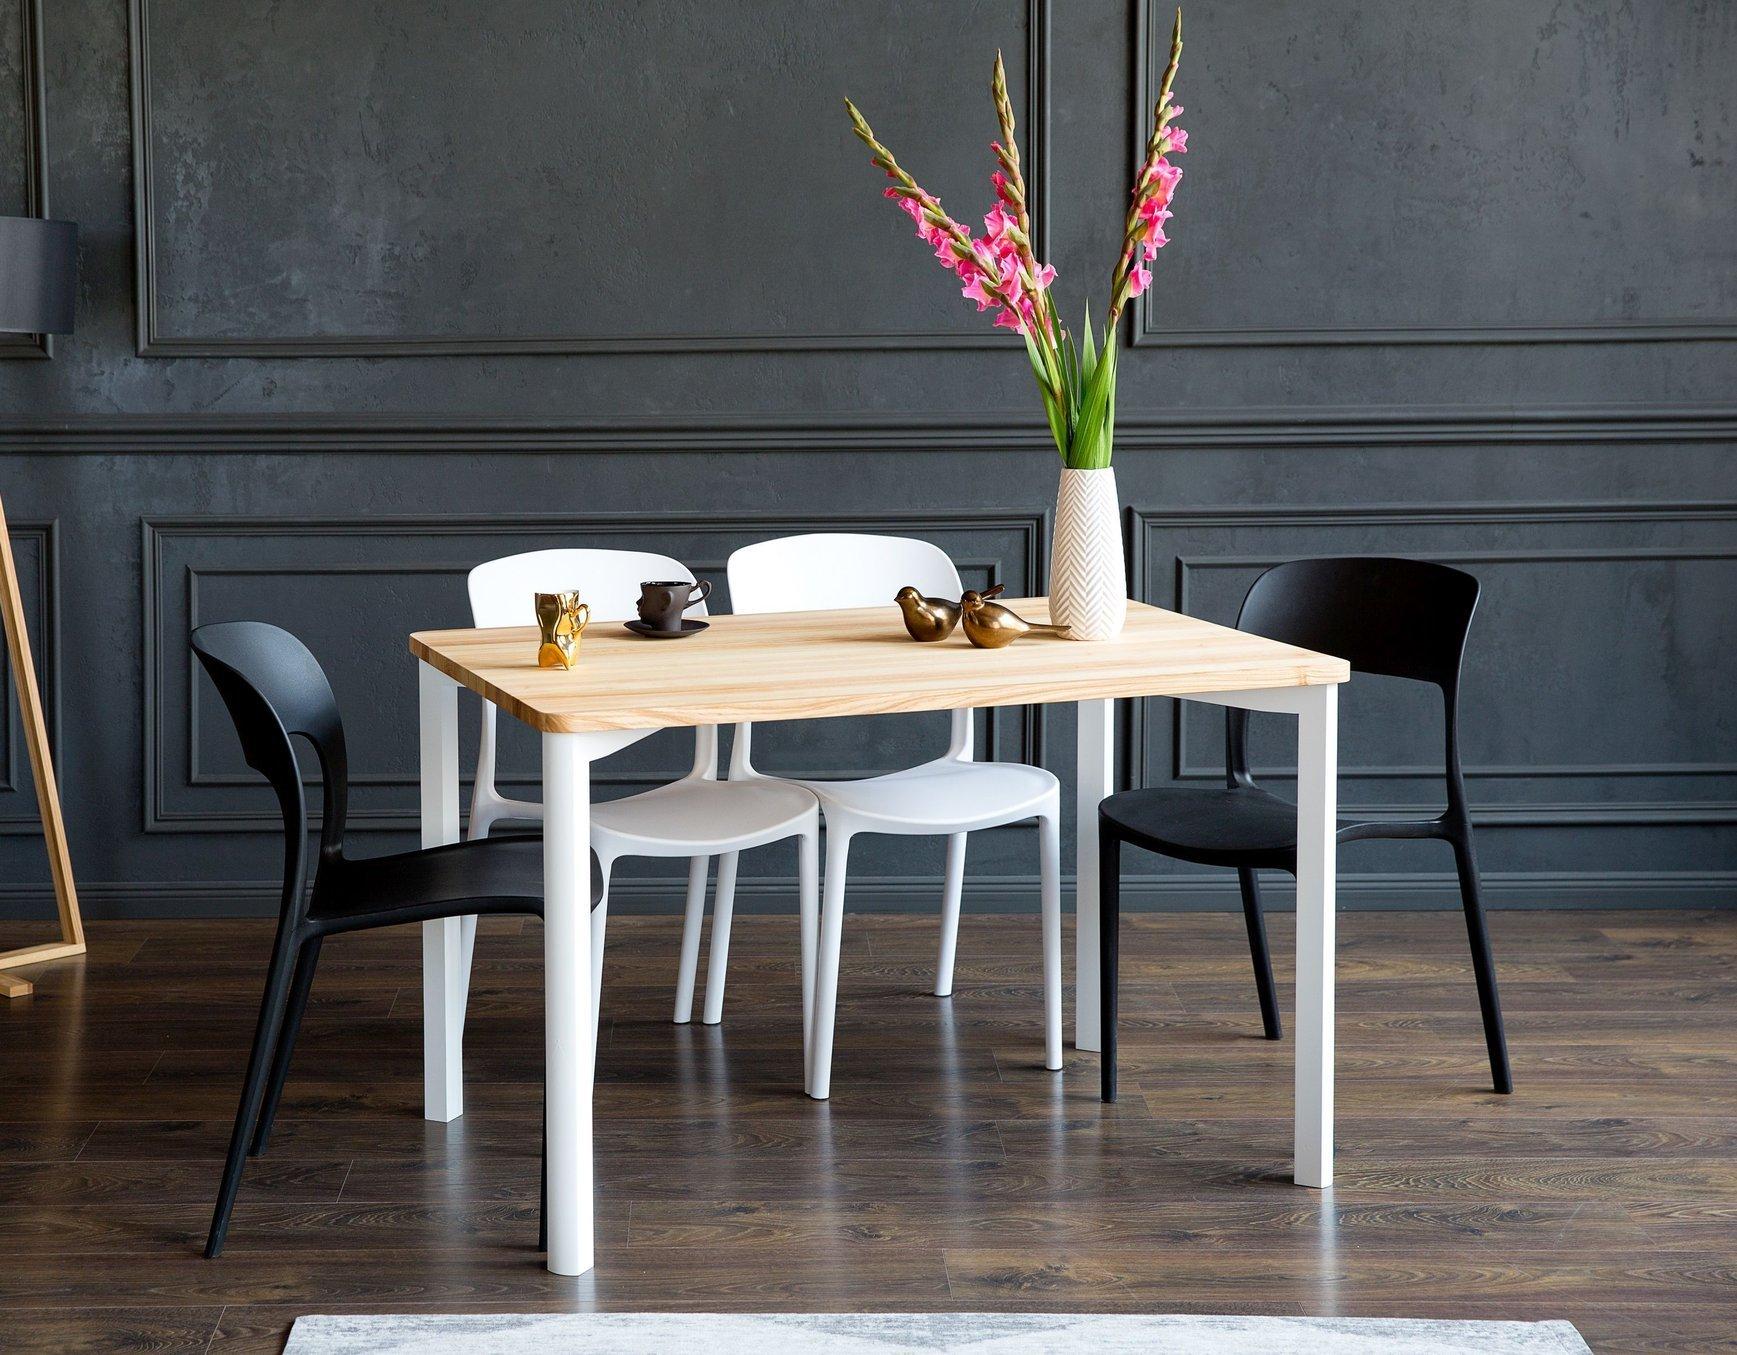 Sensational Triventi Ashwood Dining Table 120X80Cm White Round Legs Download Free Architecture Designs Rallybritishbridgeorg